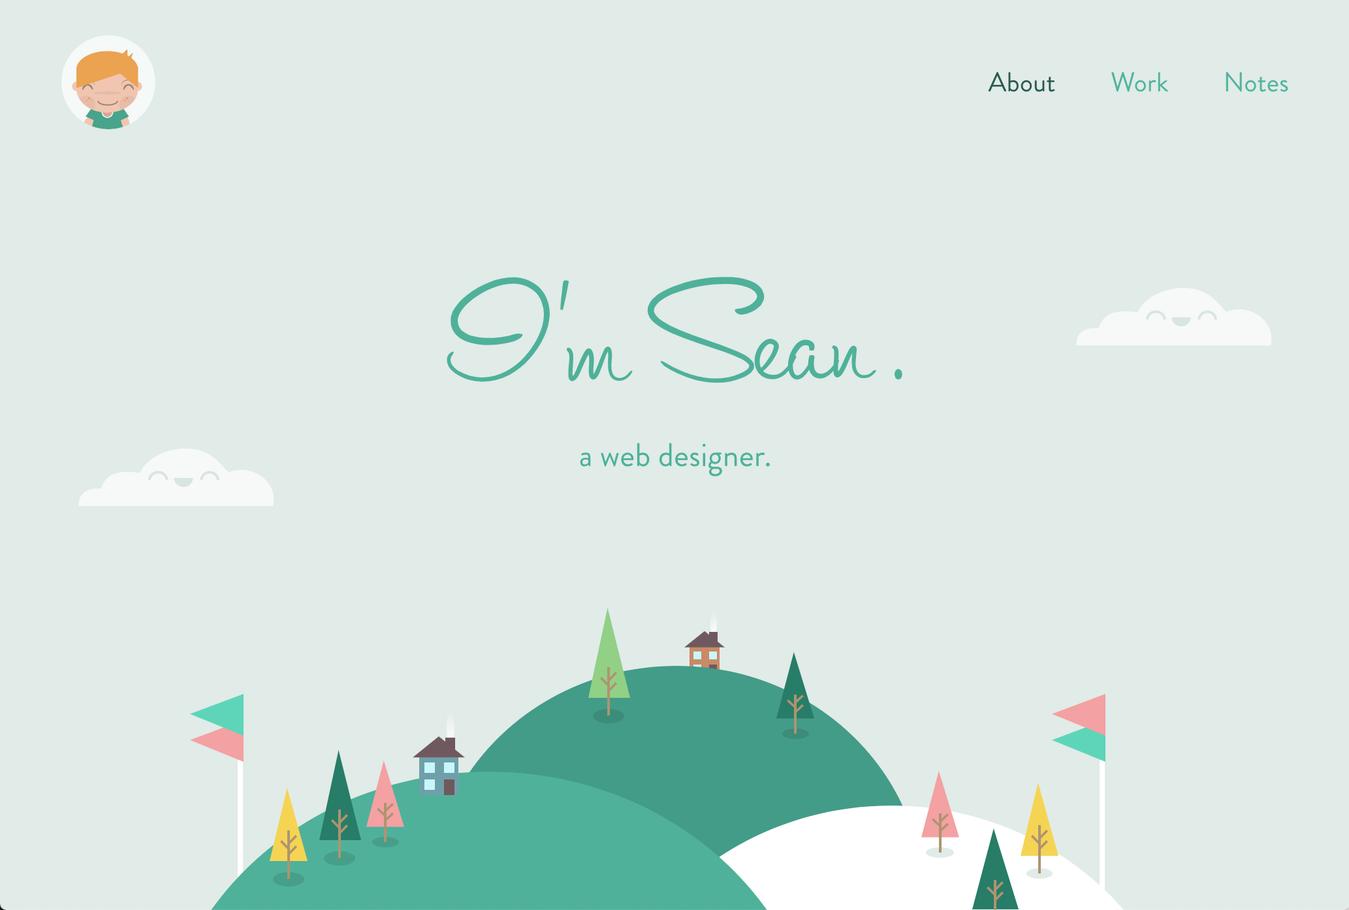 Resume Website of Sean Halpin